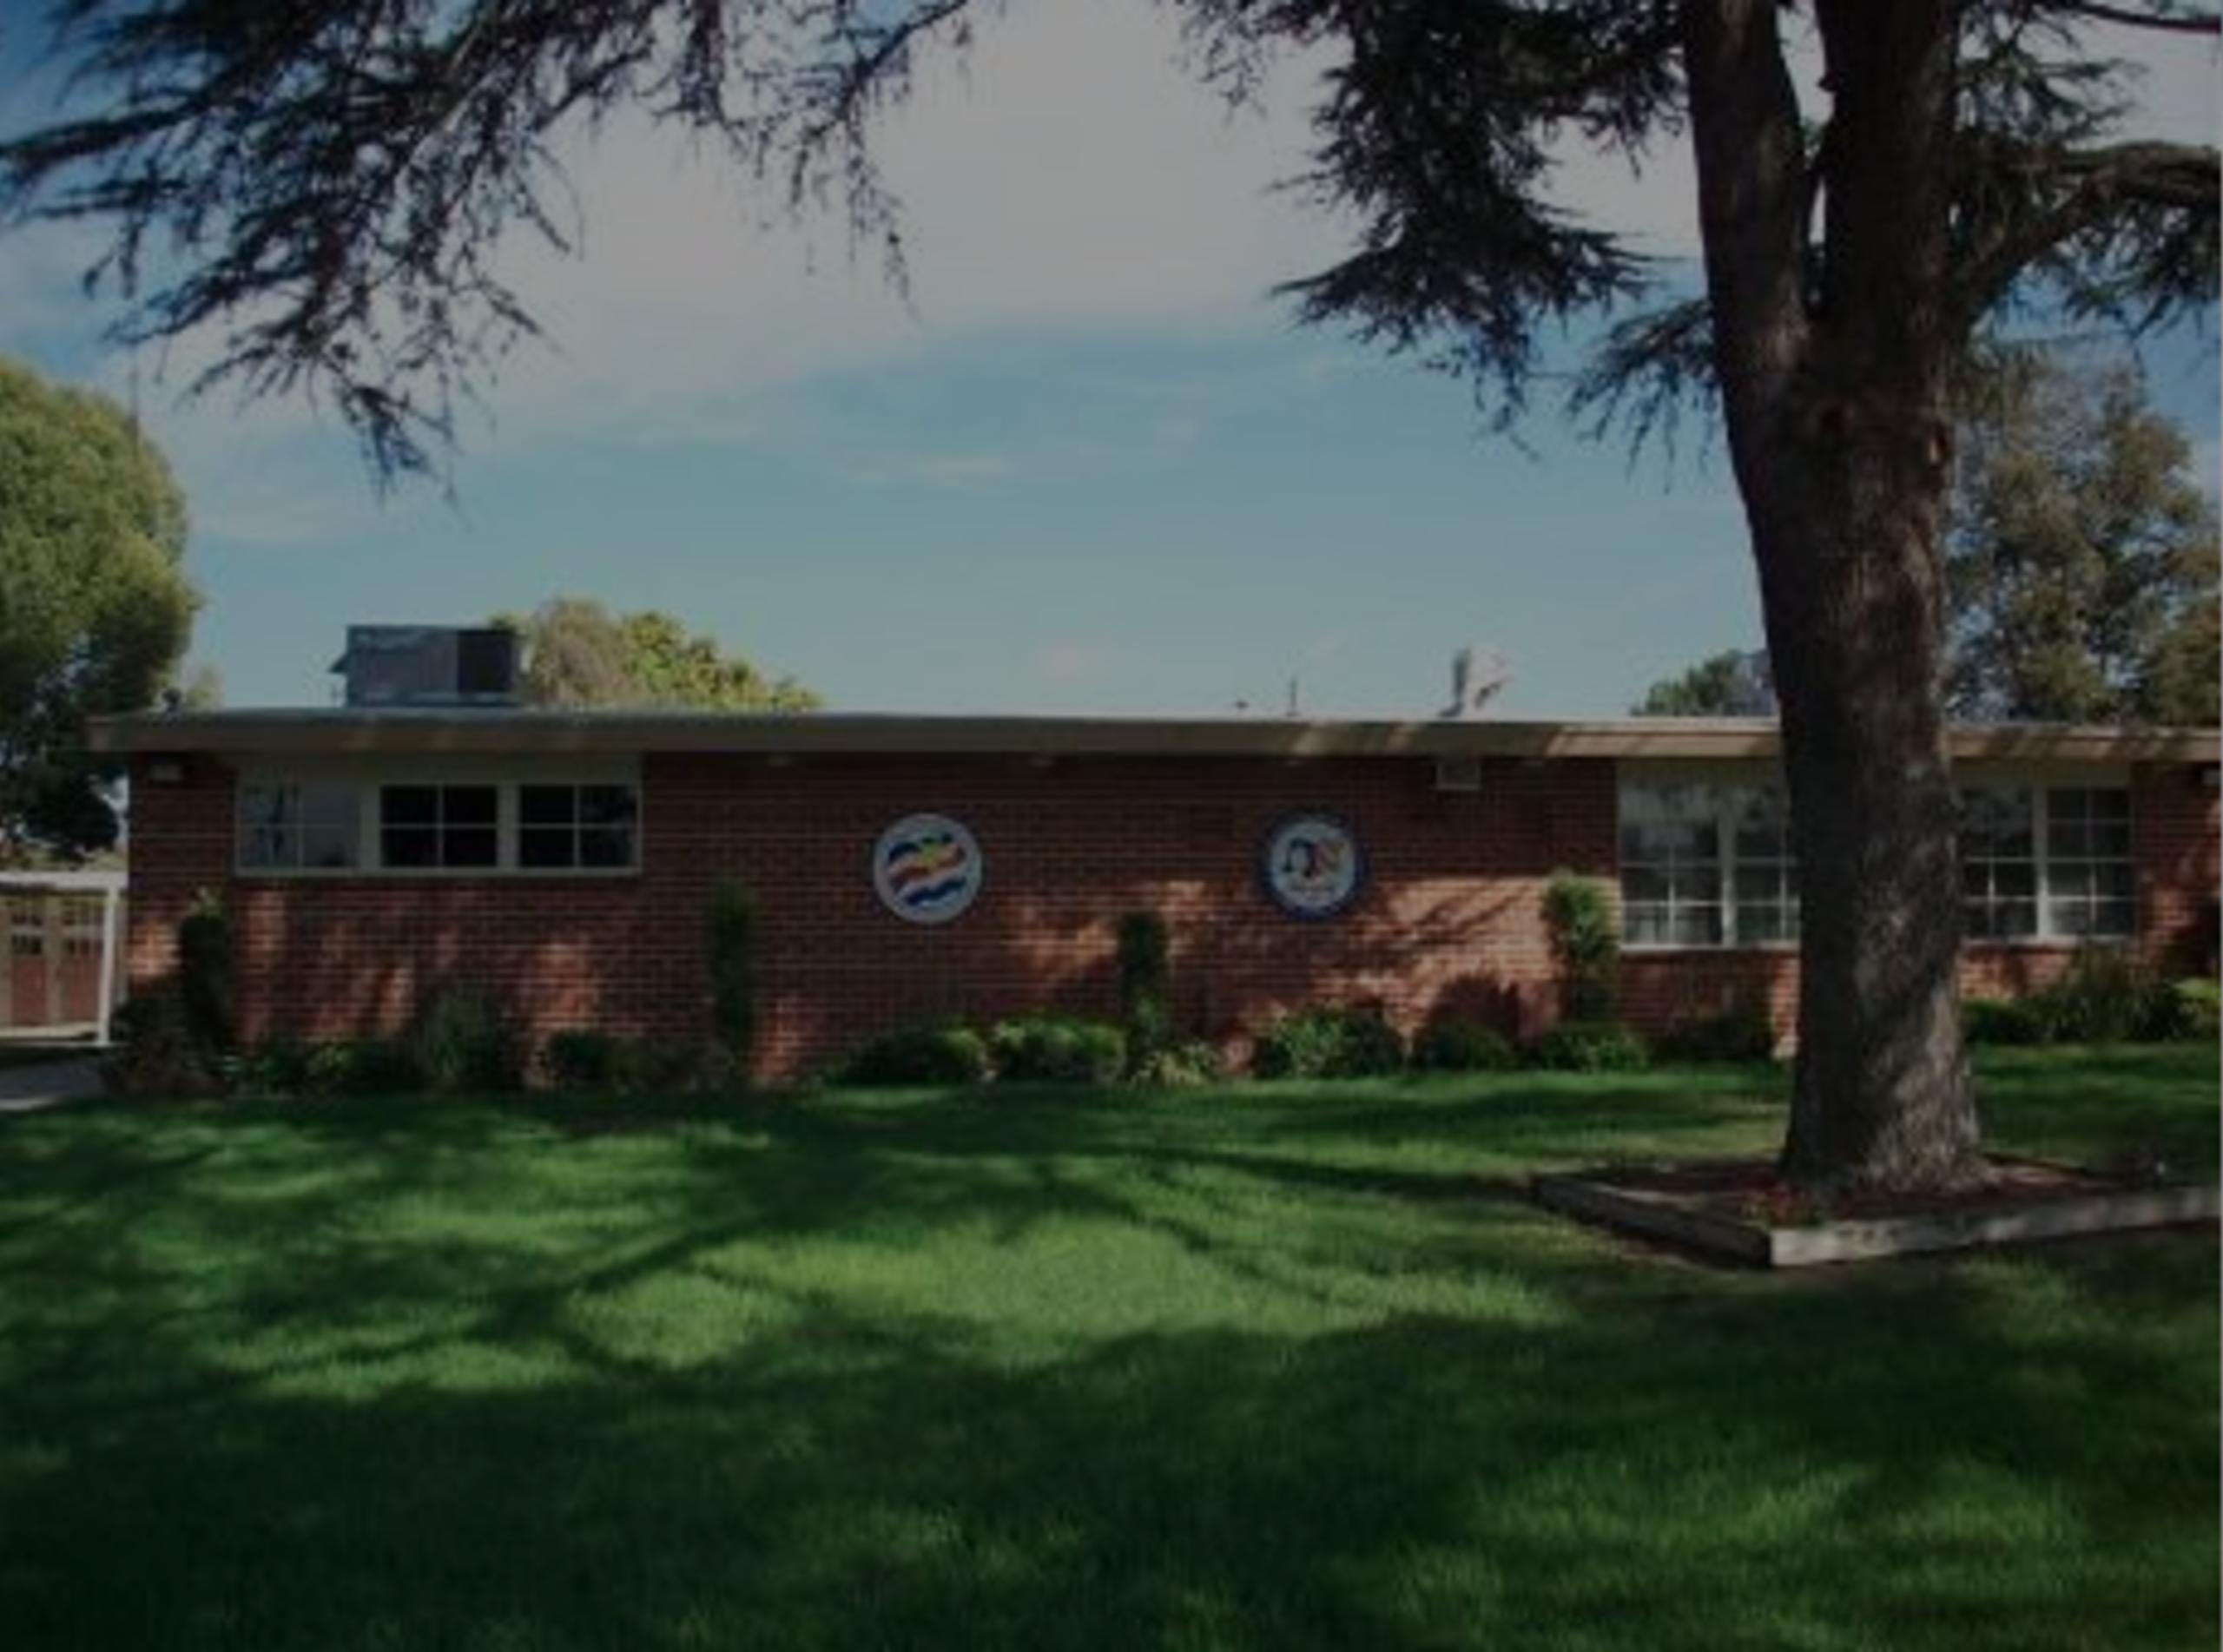 West Covina School of the Week: California Elementary School